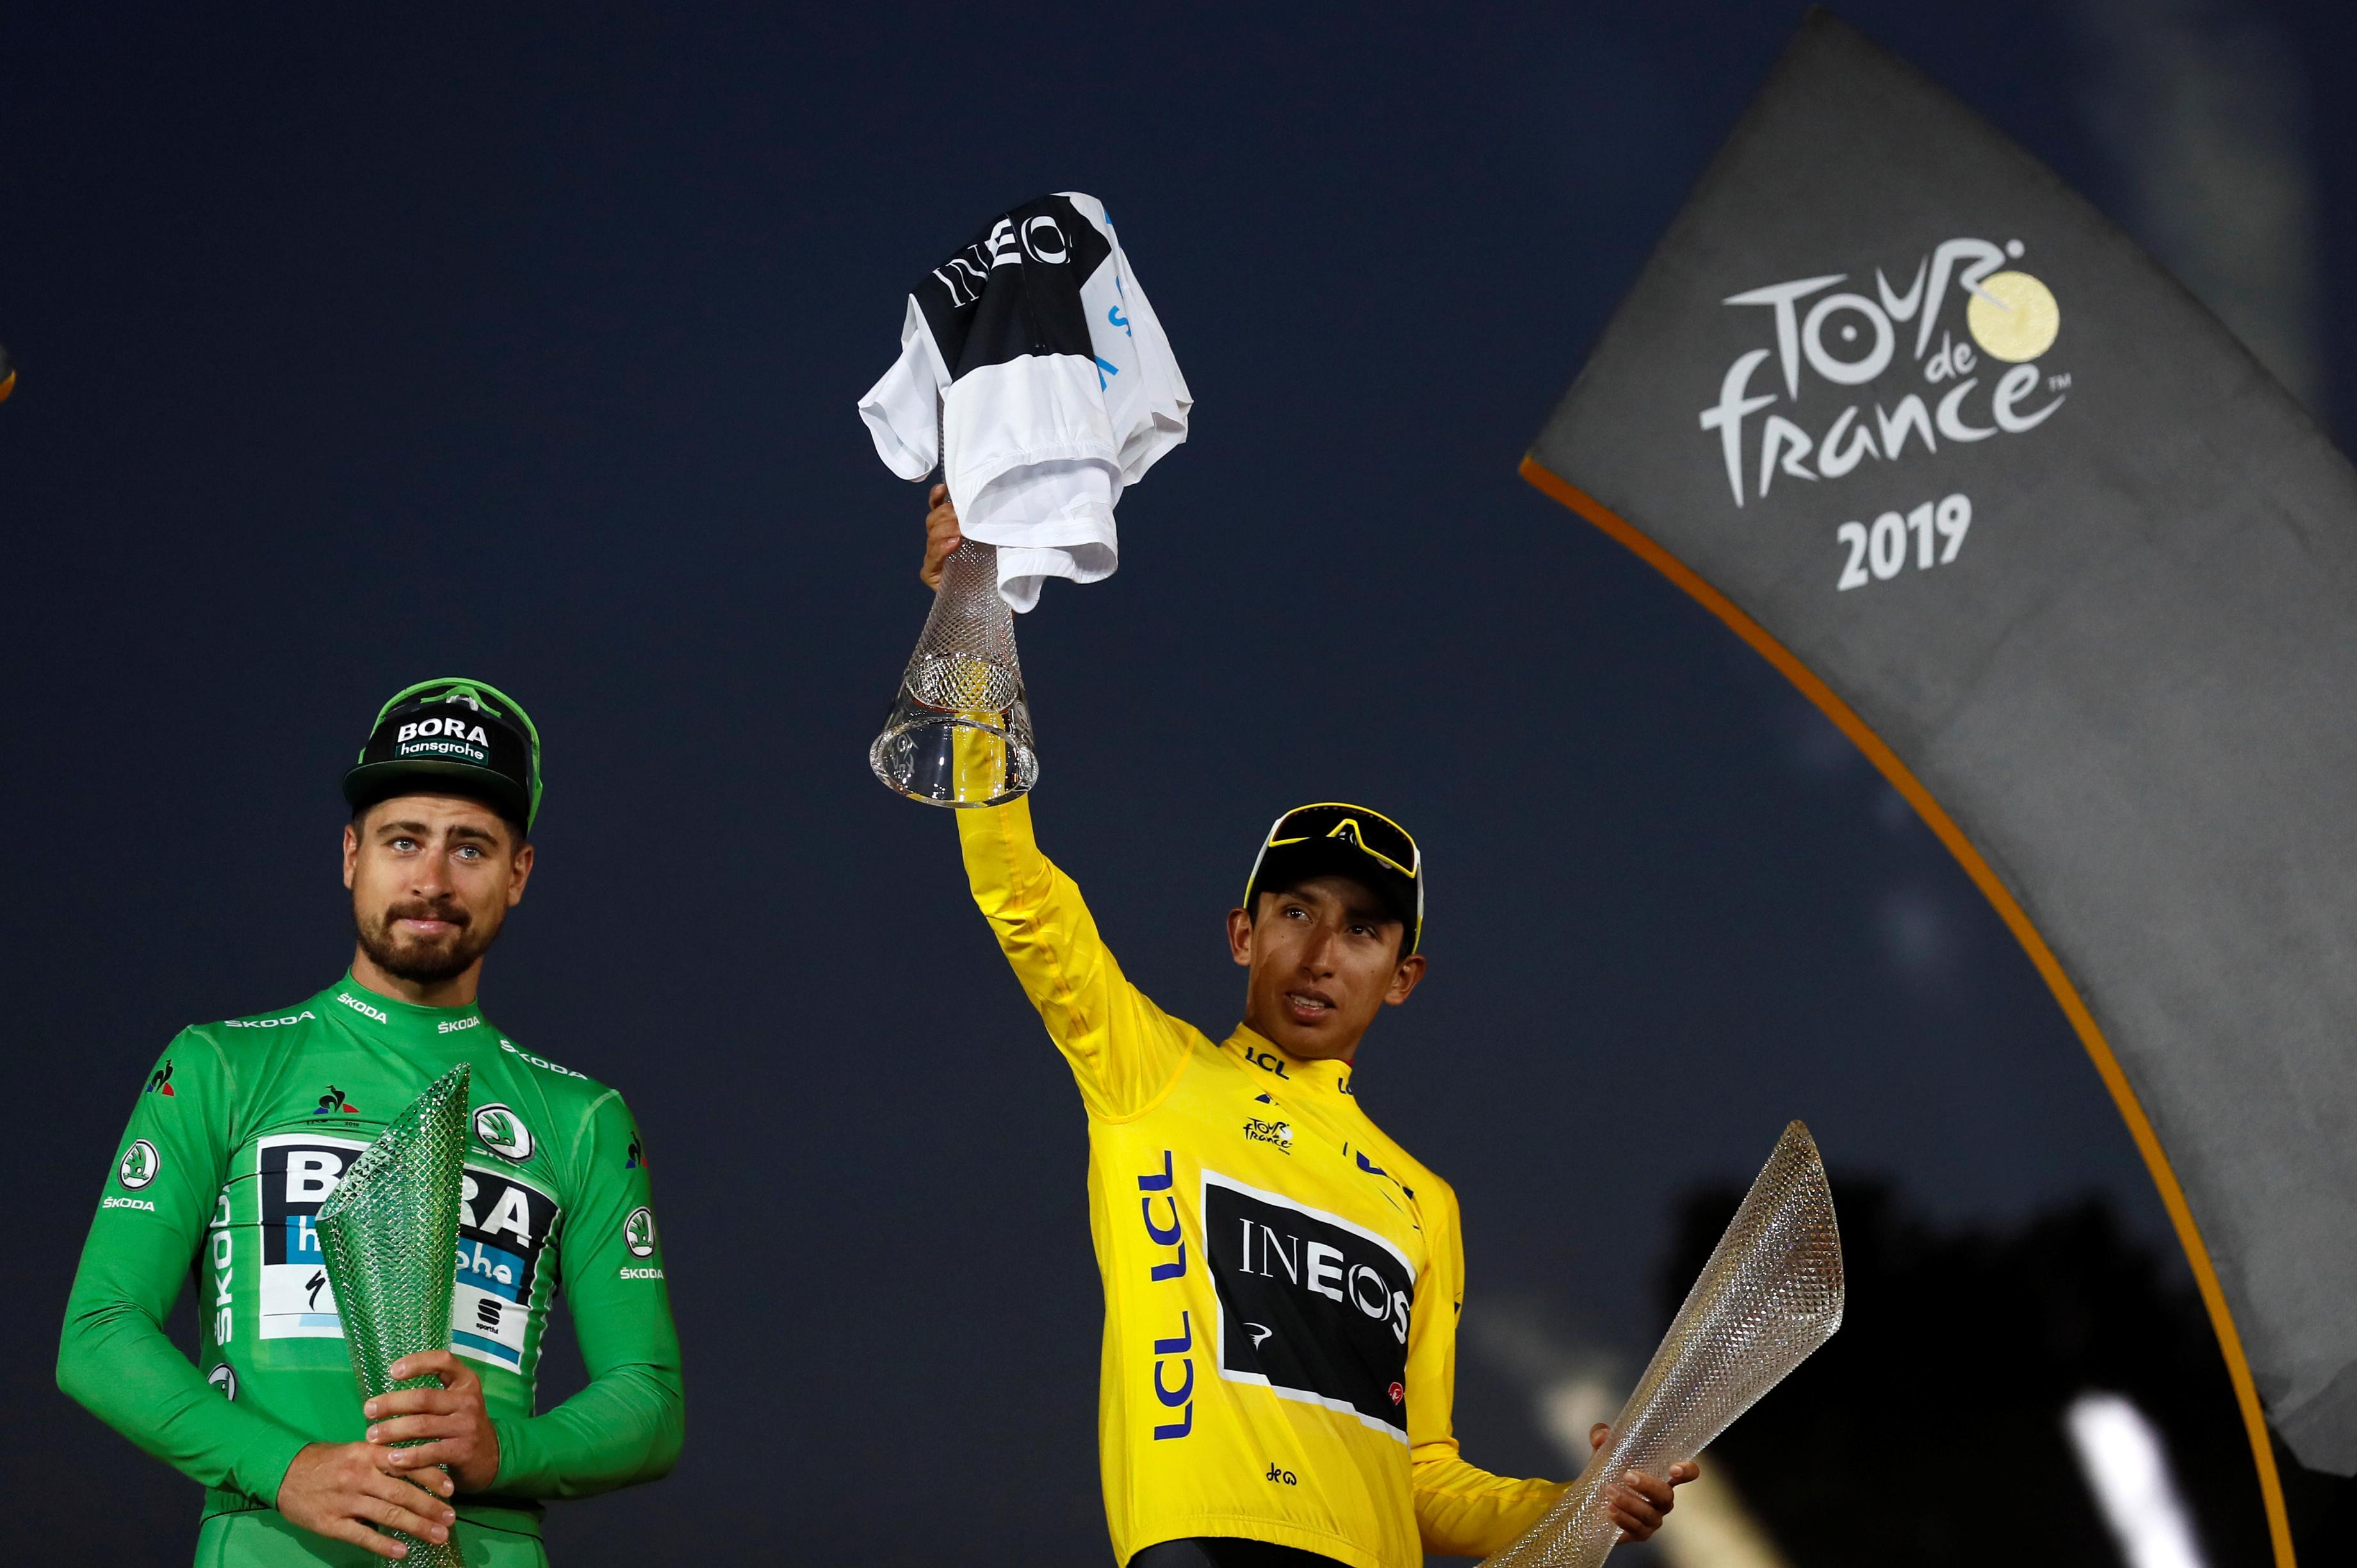 Bernal claims Colombia's first Tour de France title